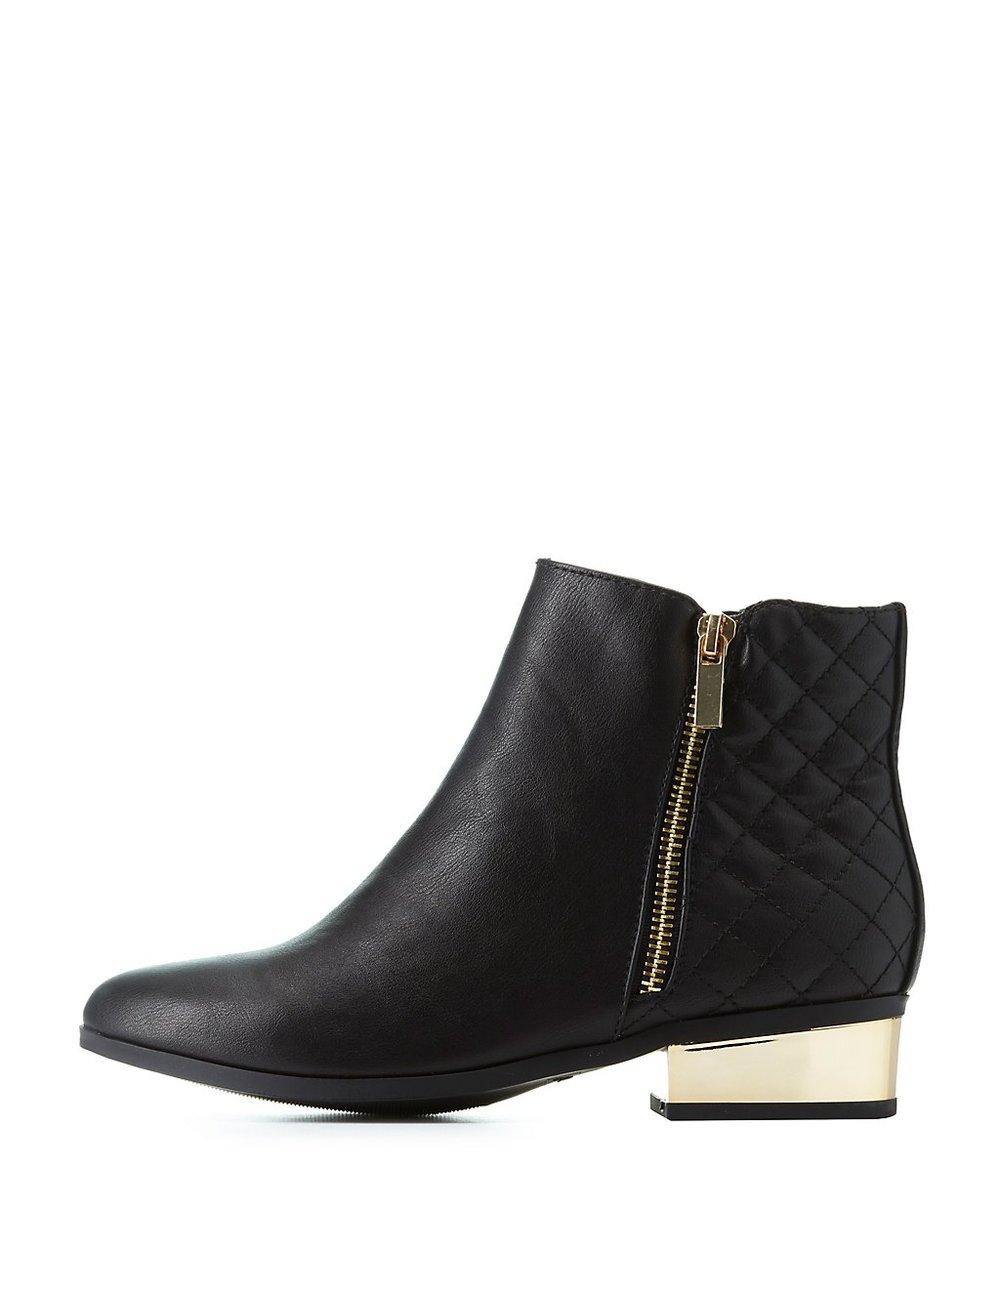 black friday sales charlotte russe leather zip booties